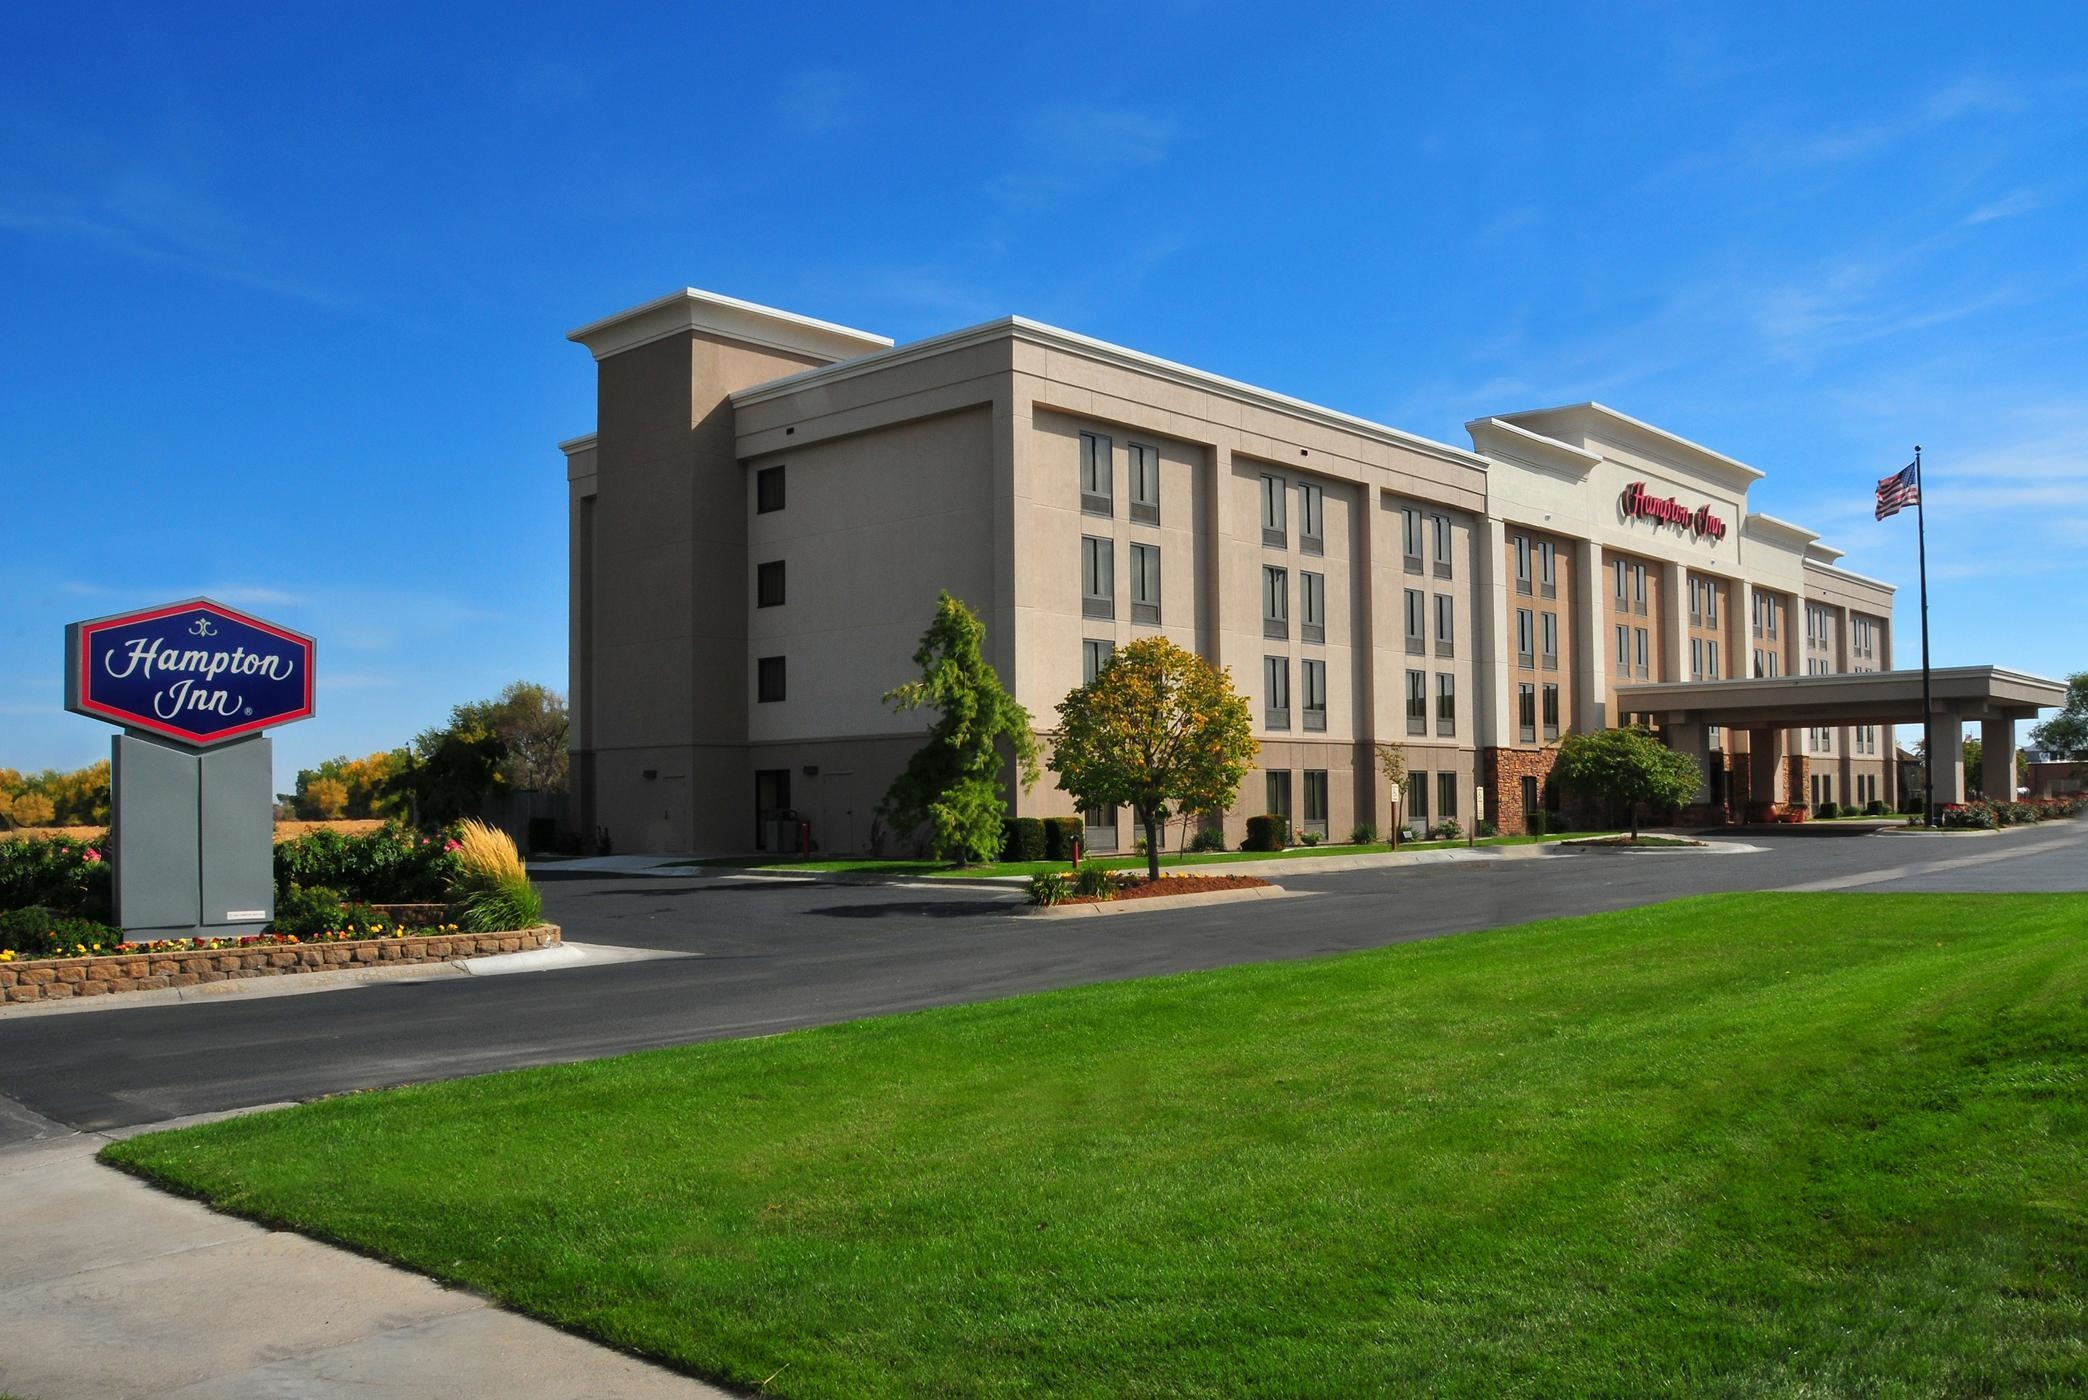 Hotels And Motels In North Platte Nebraska